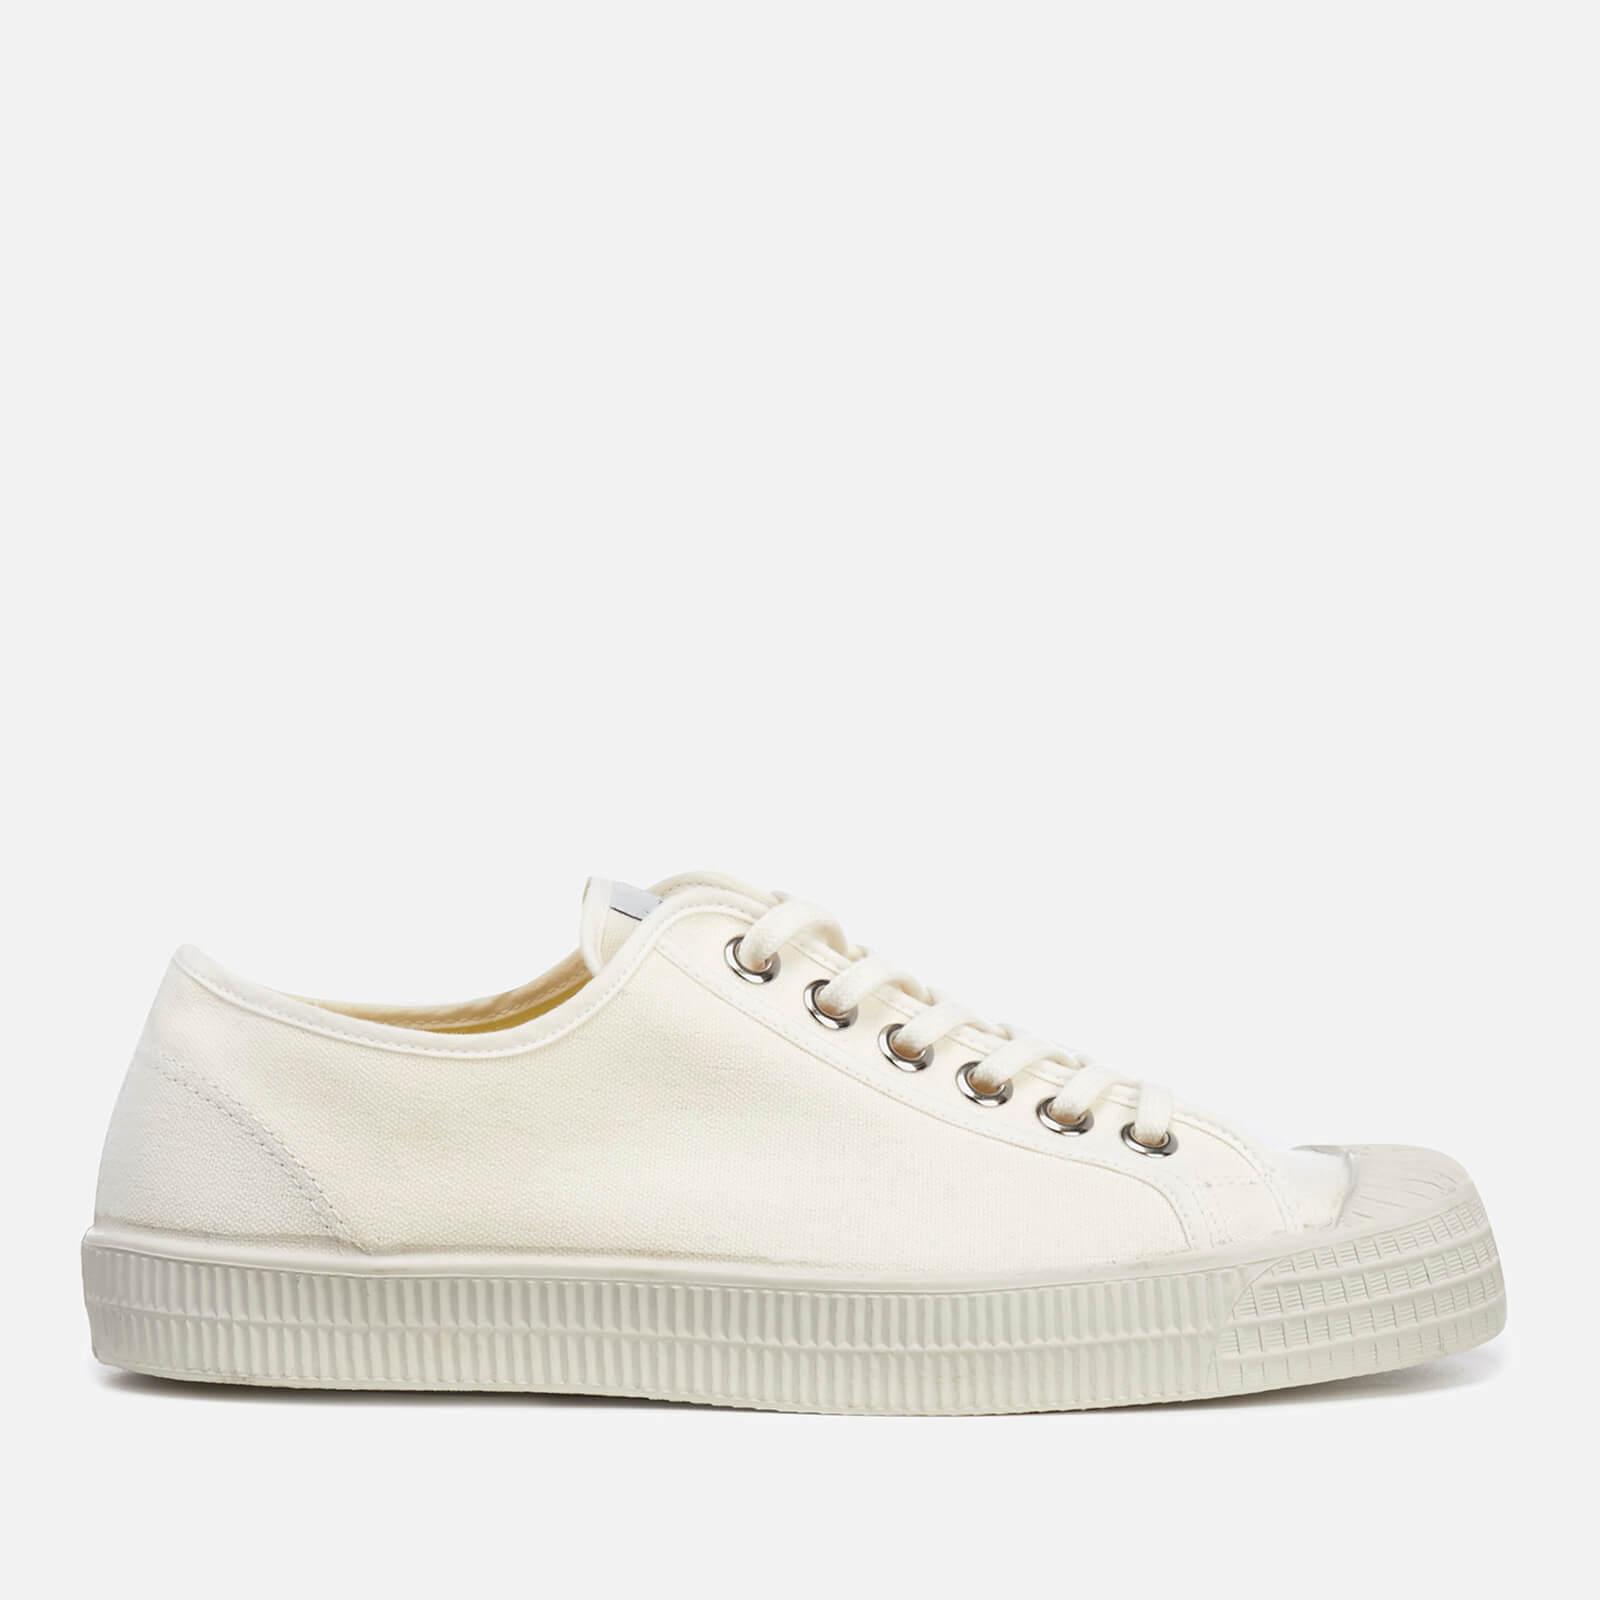 8c7ac6cbe94e7f Novesta Star Master Classic Trainers - White Mens Footwear